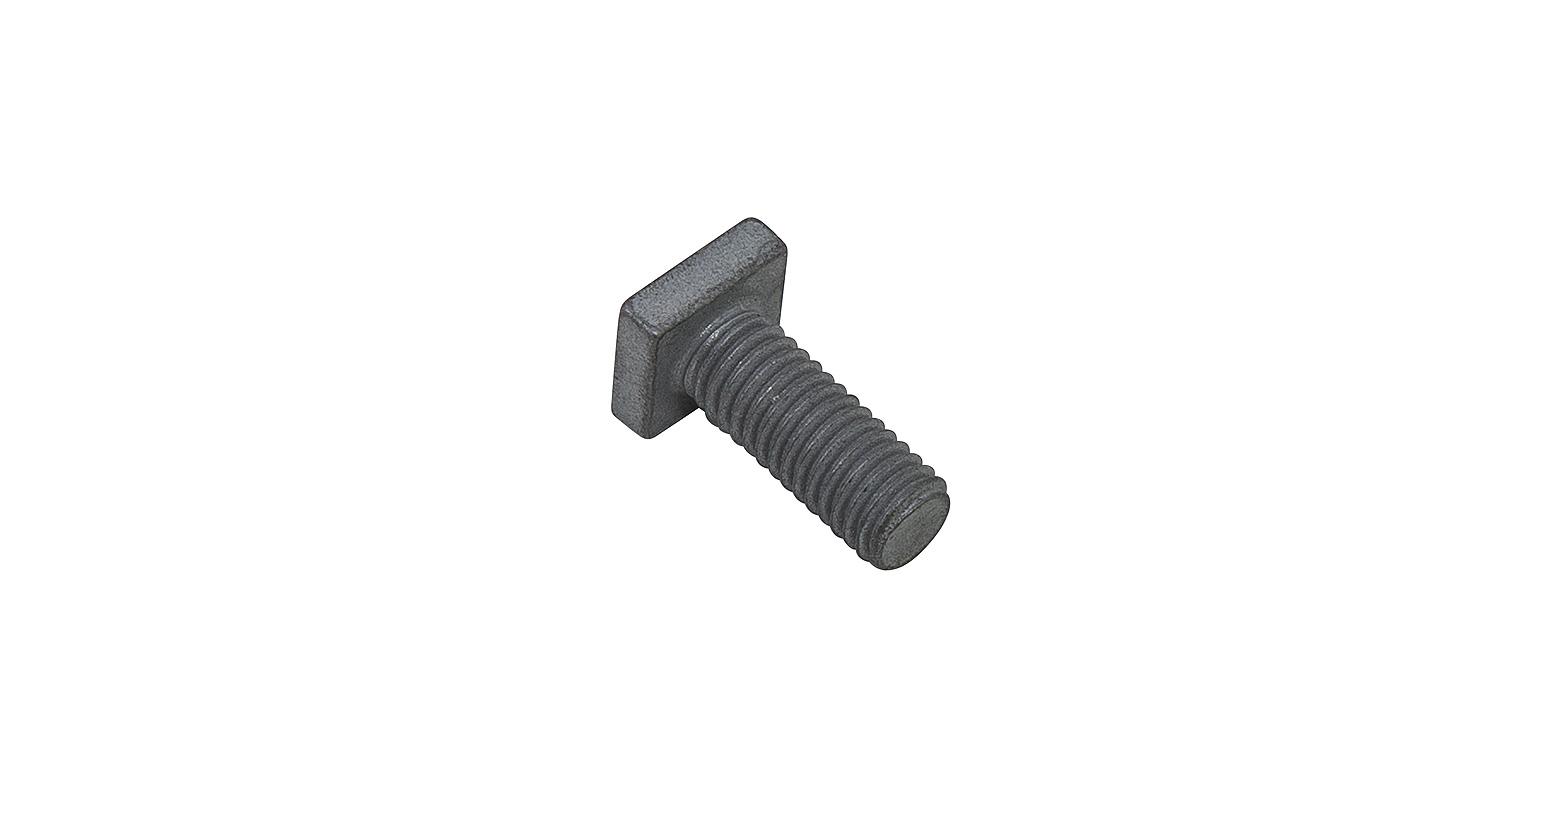 B096 Bp M8 X 20mm Steel T Bolt 4 Pack Rhino Rack